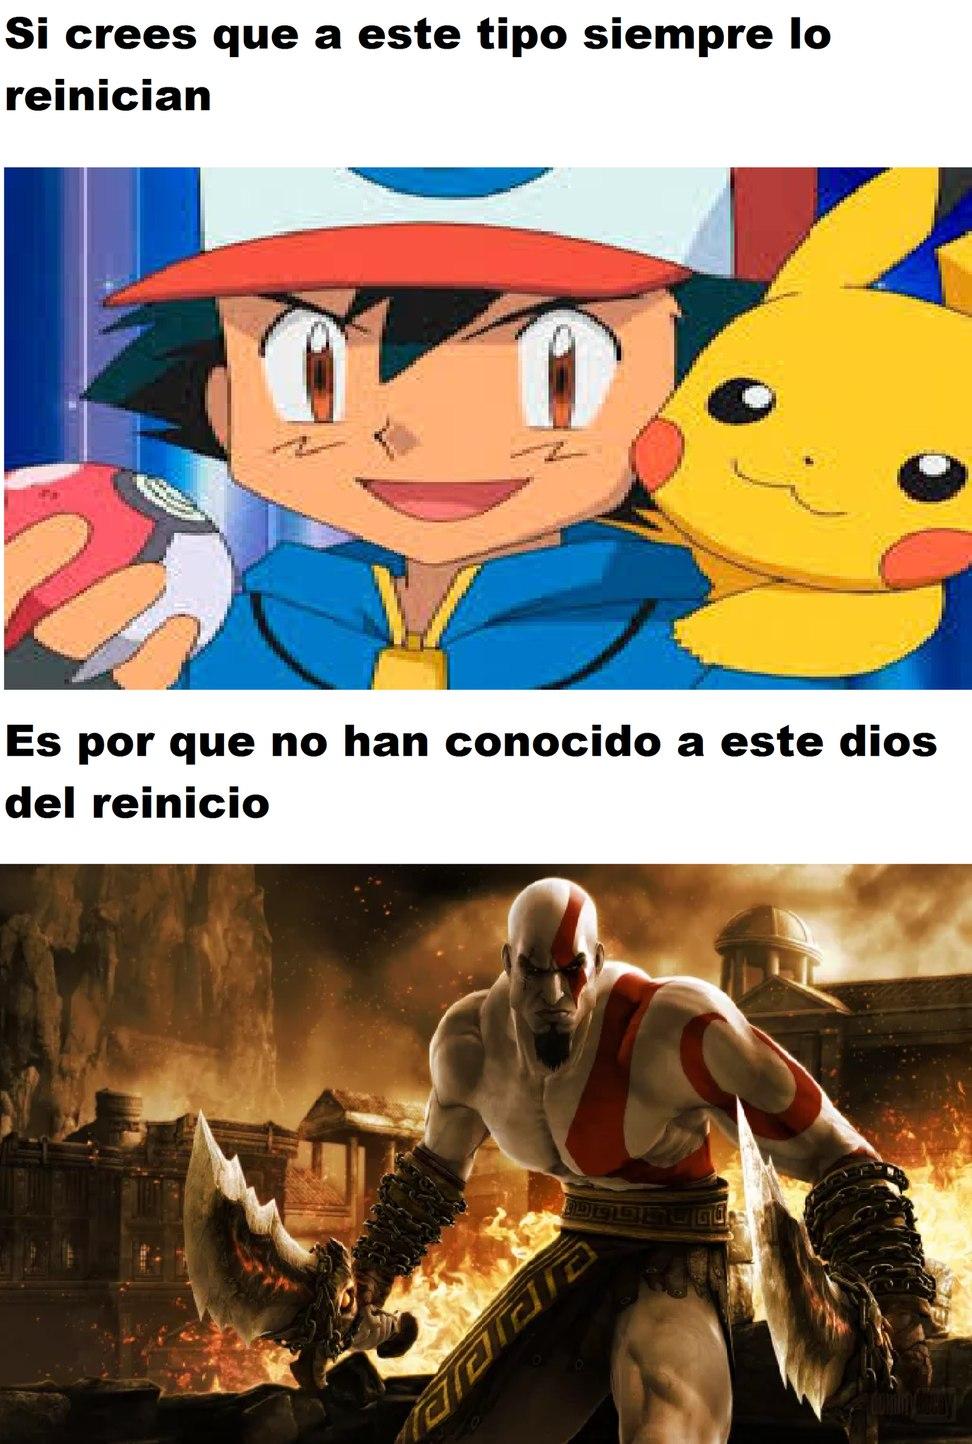 Reinicio - meme